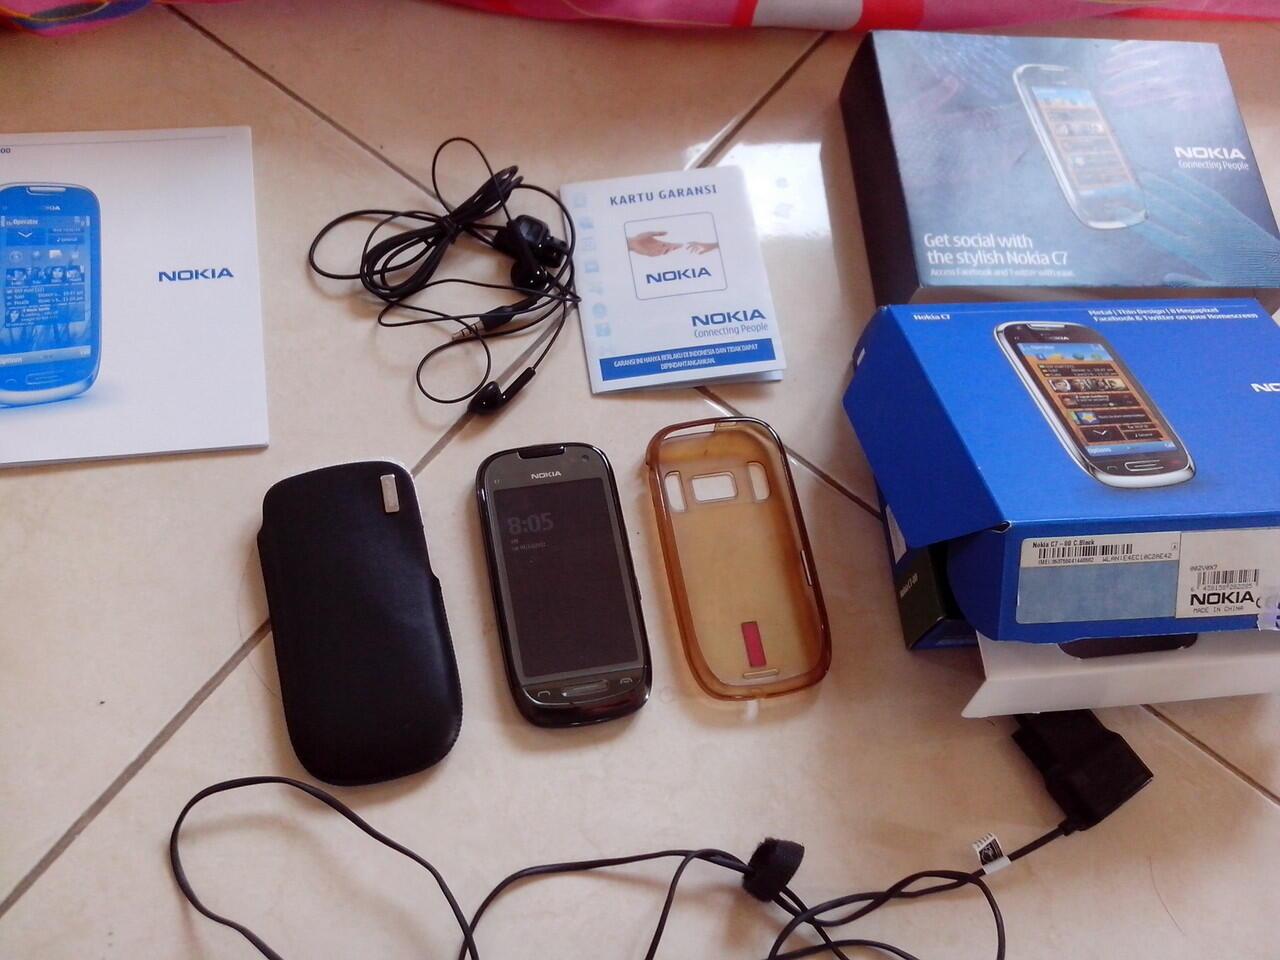 Jual Nokia C7 second like